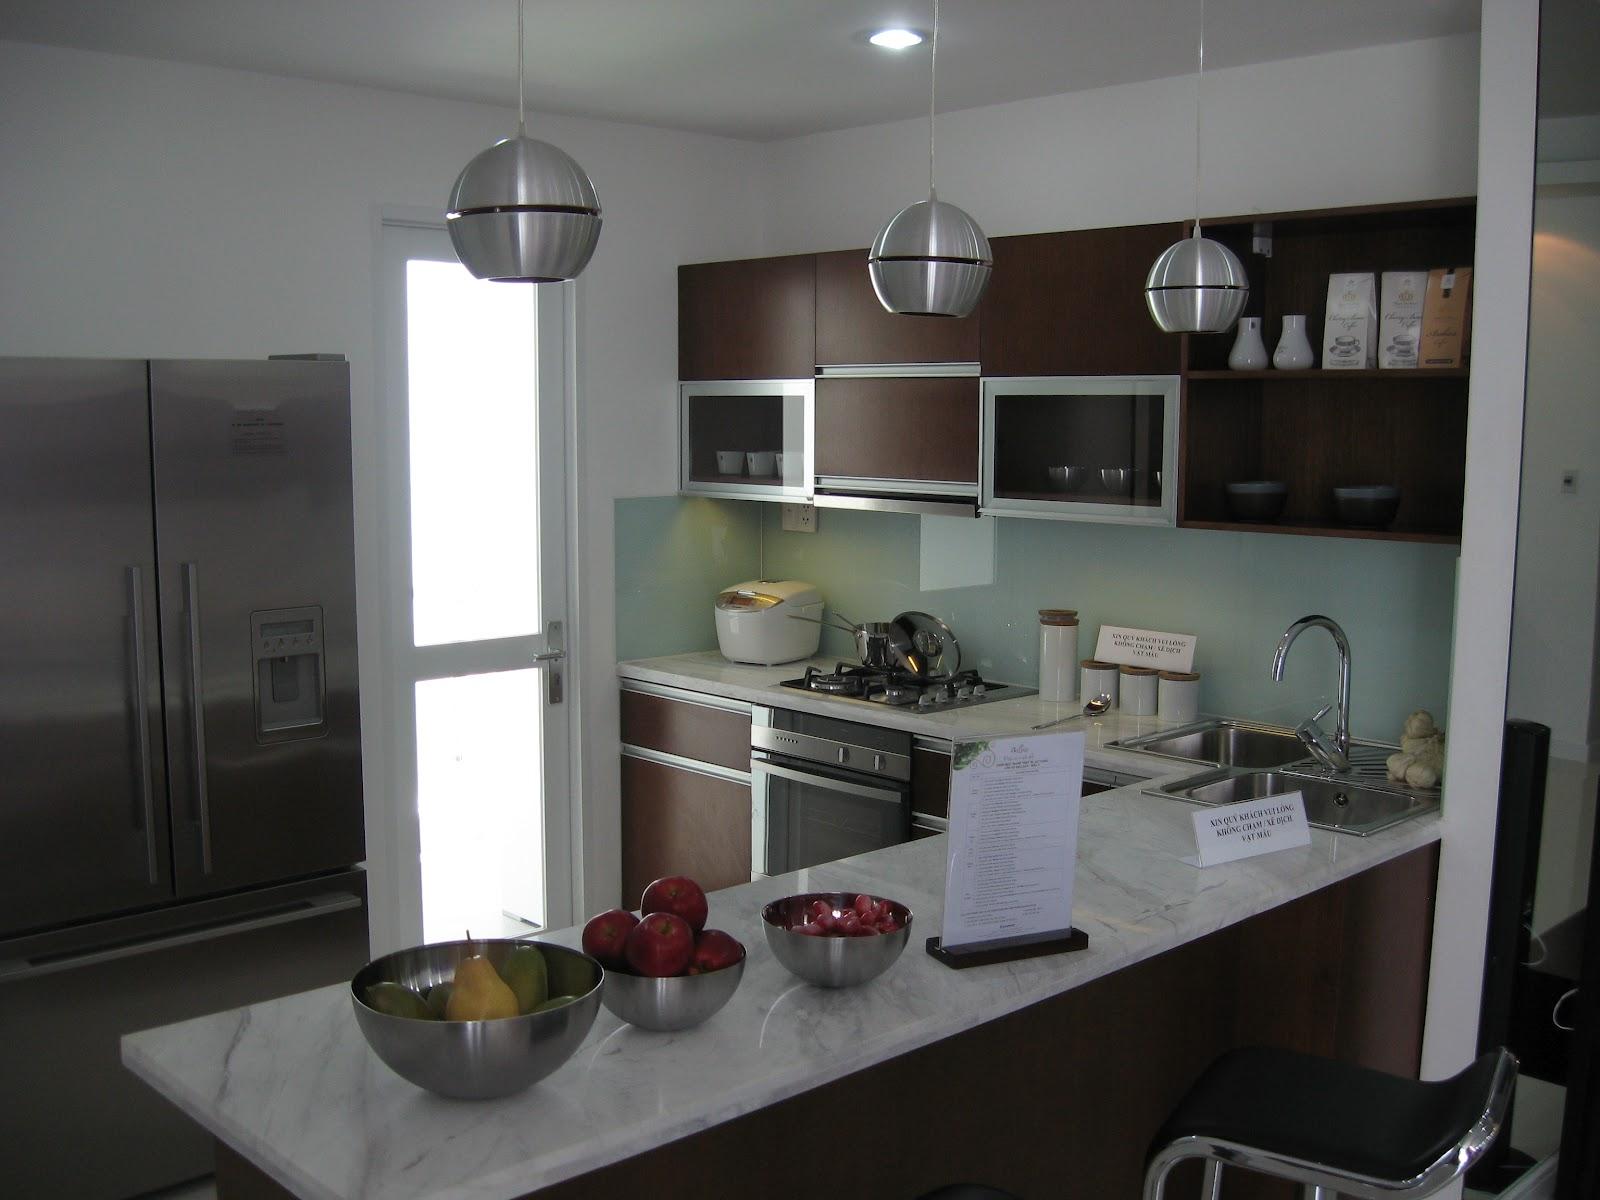 BÁN LỖ CĂN HỘ BELLEZA 105 m2, Quận 7